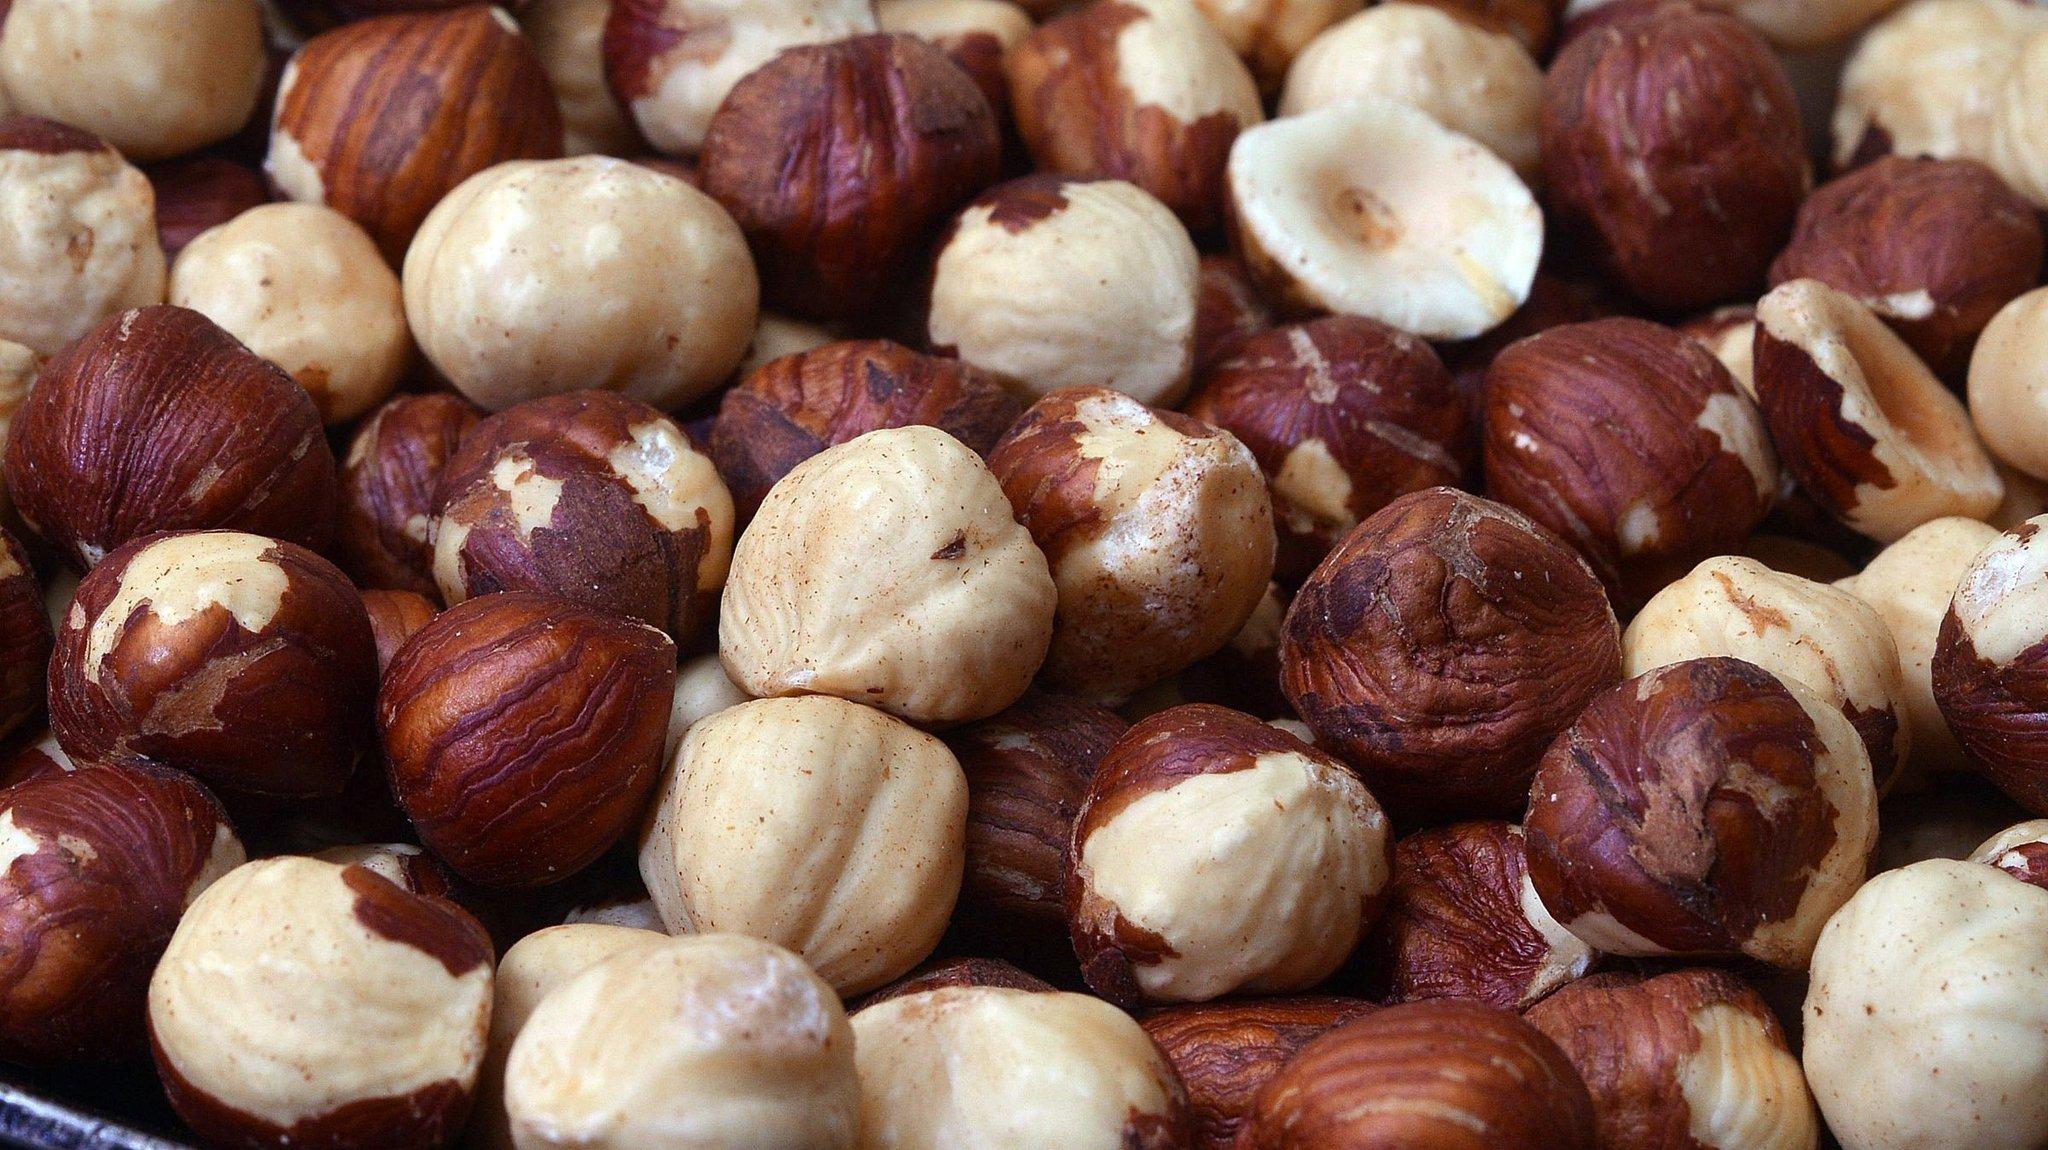 Is hazelnut milk the new almond milk? - LA Times